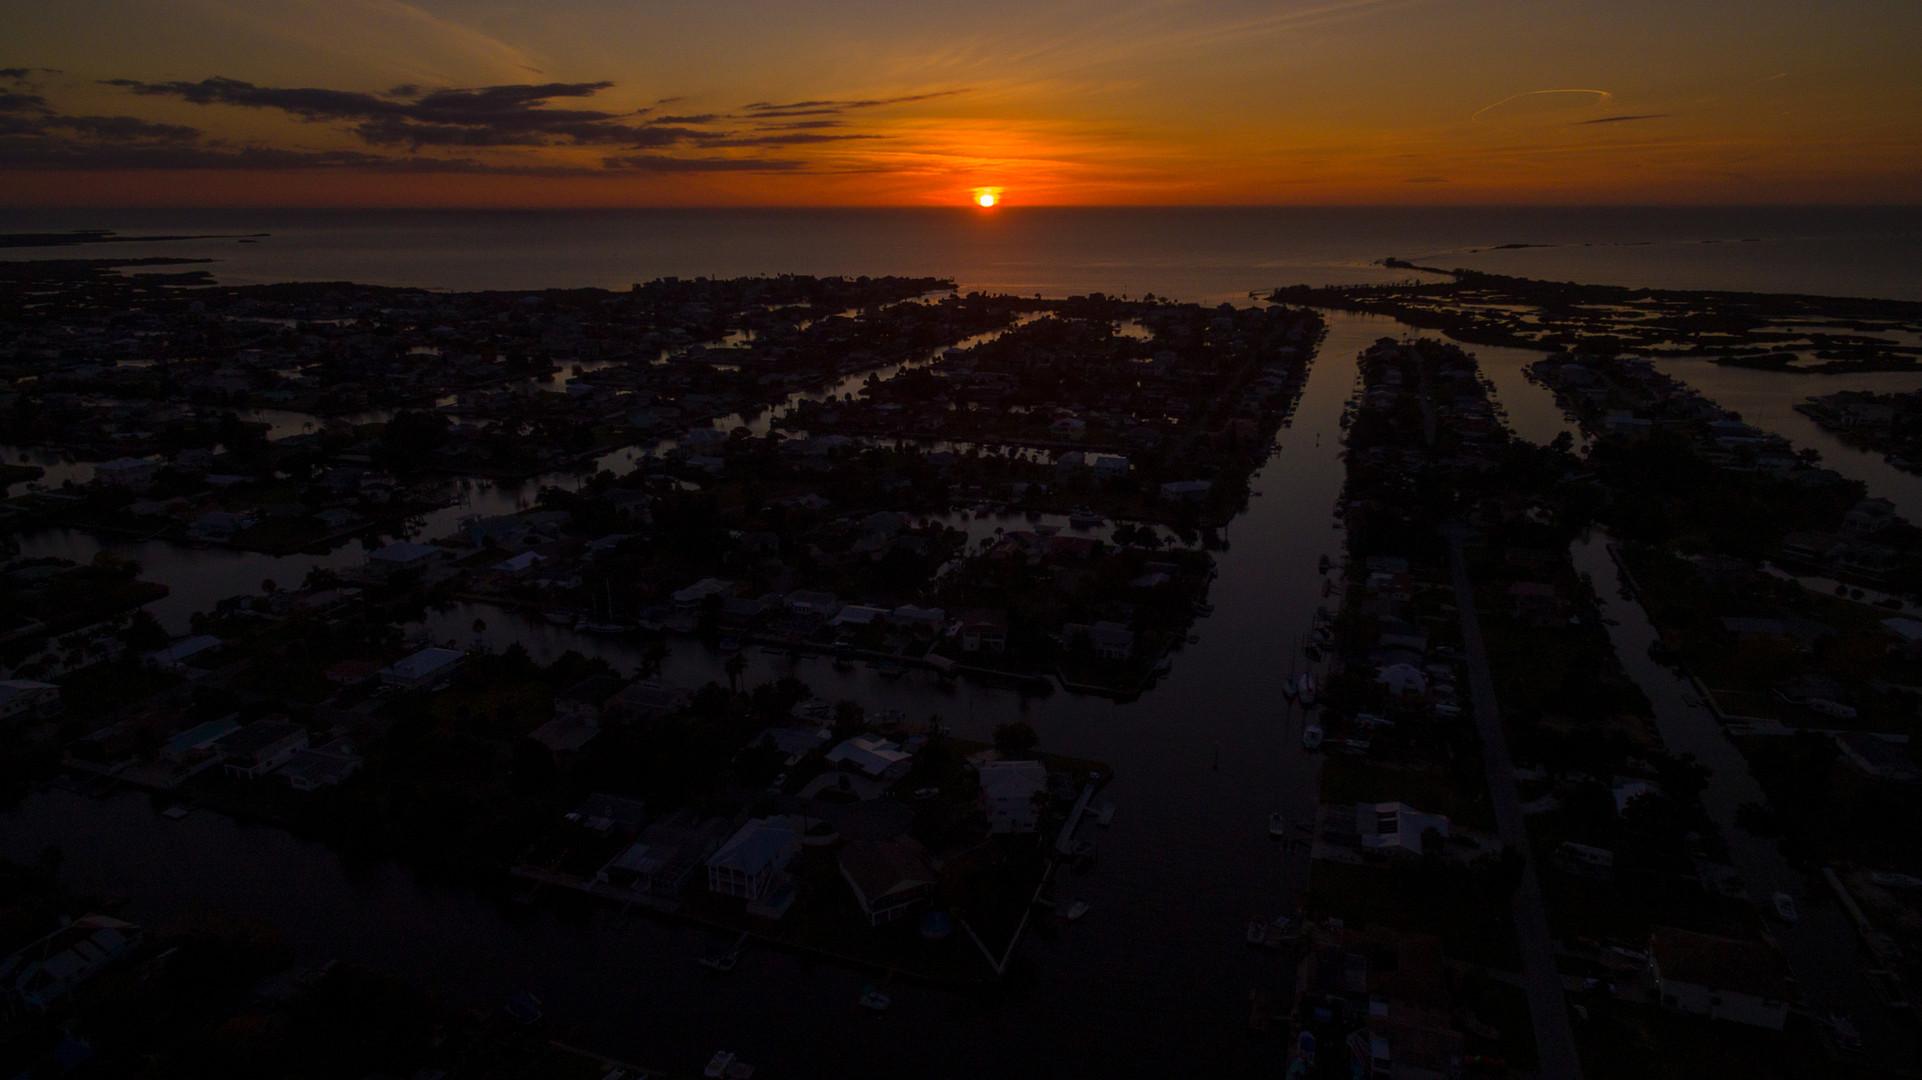 Sunset on Hernando Beach, Florida